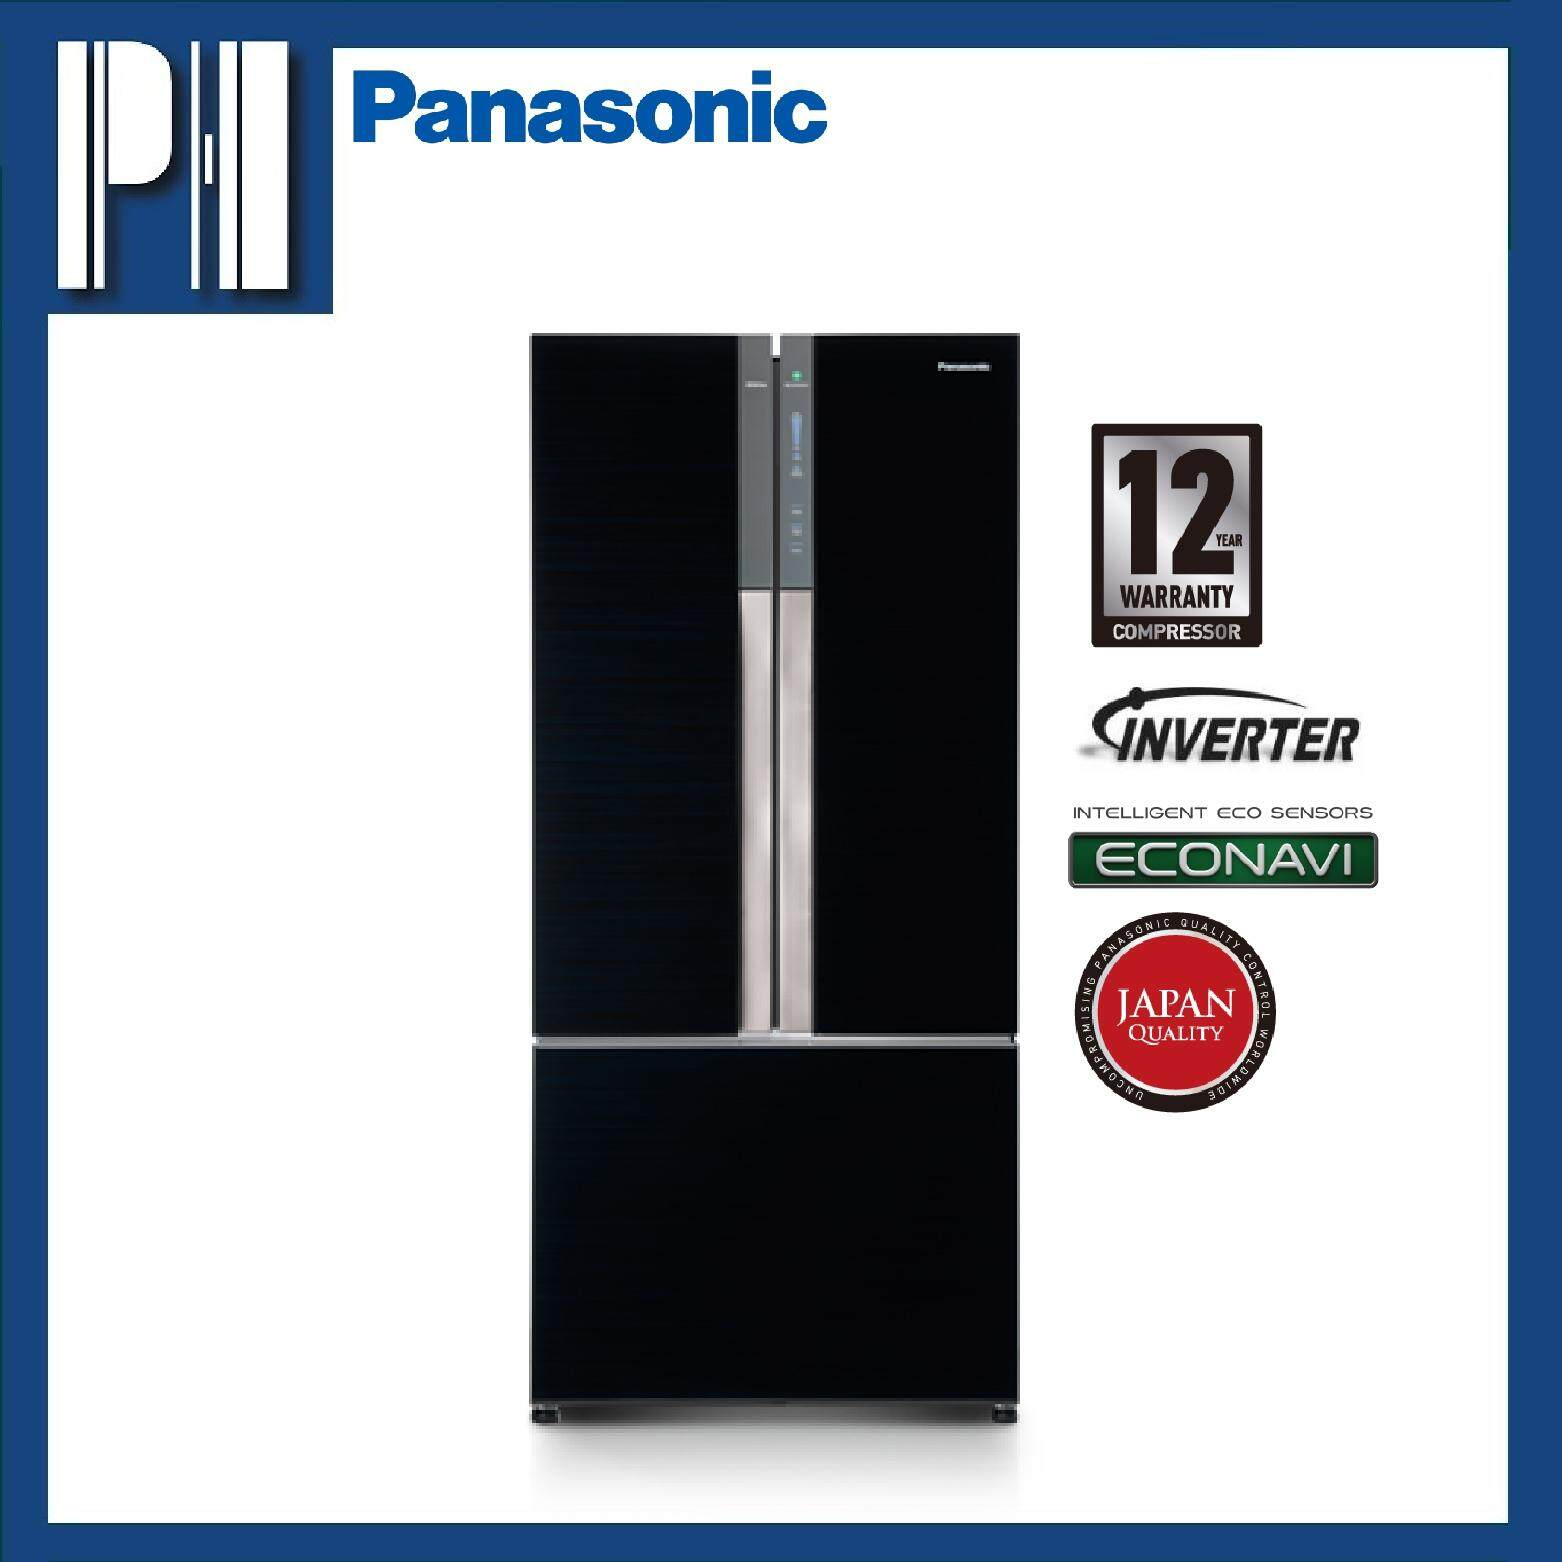 PANASONIC NR-CY558GKMY 547L ECONAVI Inverter Multi Door Fridge/Refrigerator